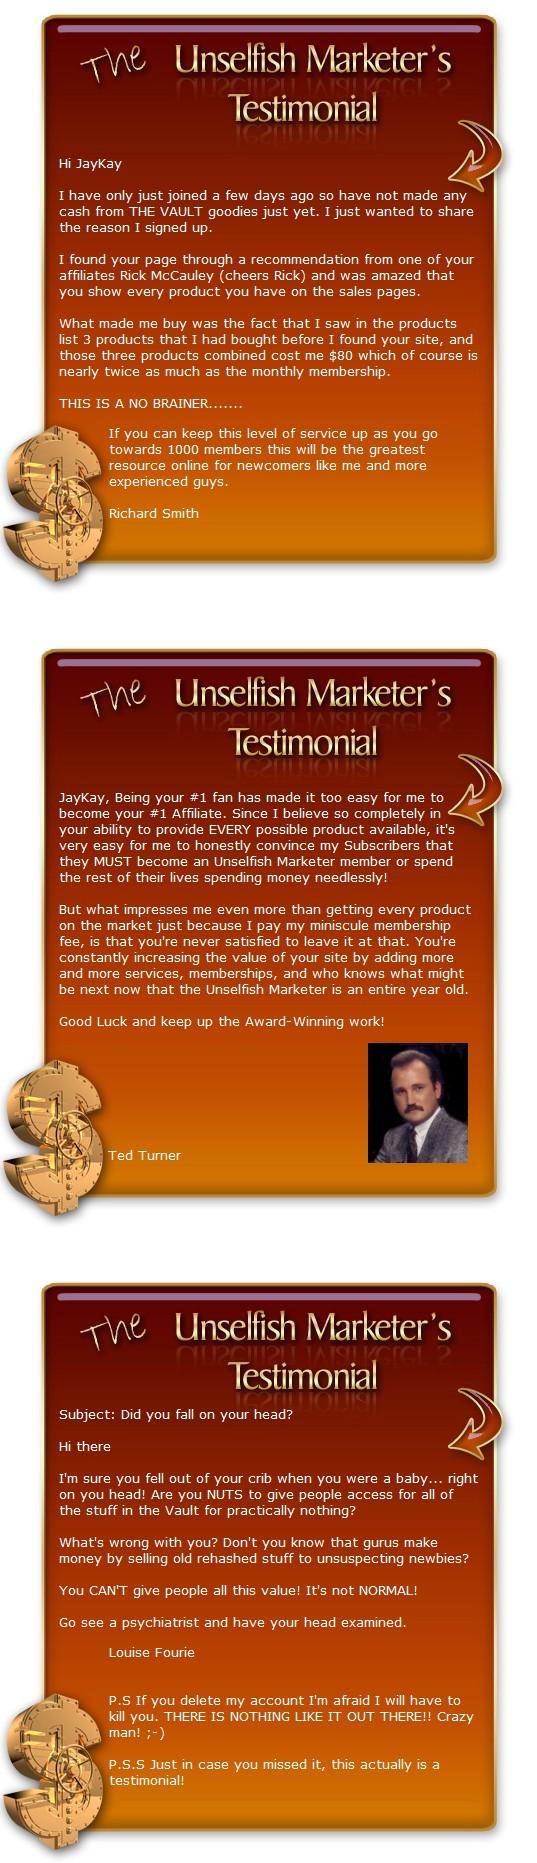 unselfish marketer testimonials 2